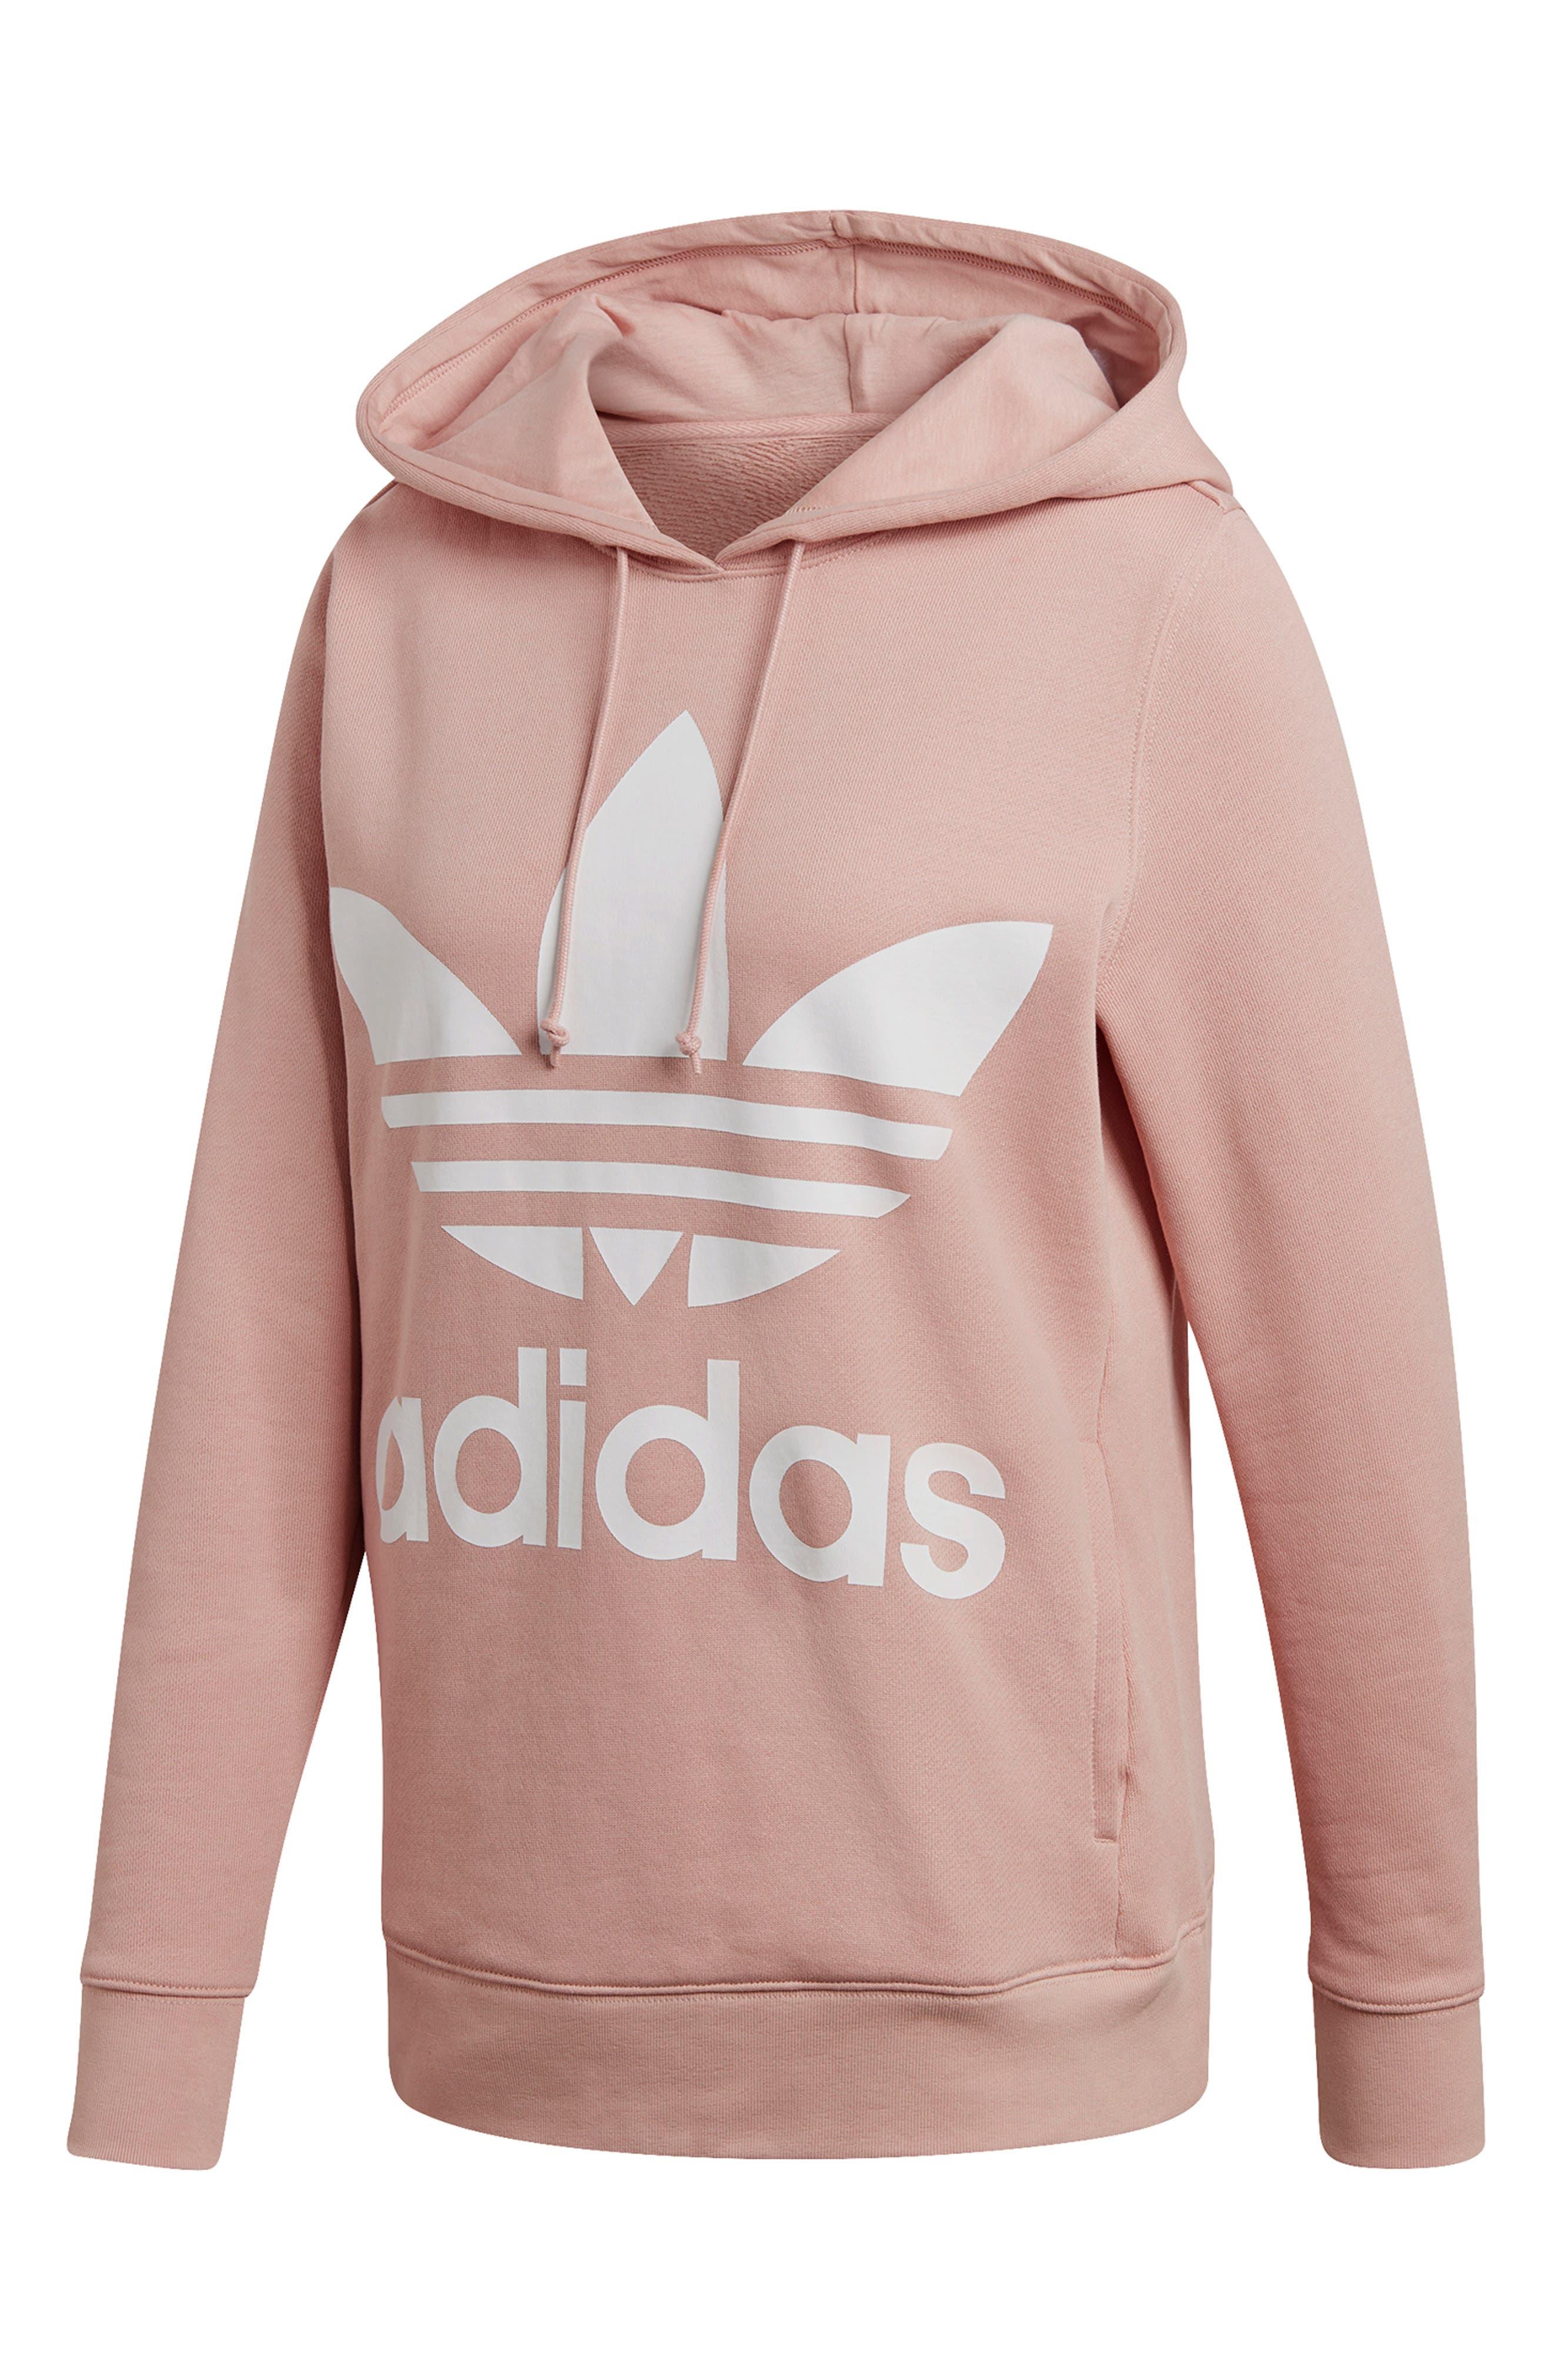 Adidas Originals Trefoil Hoodie, Pink